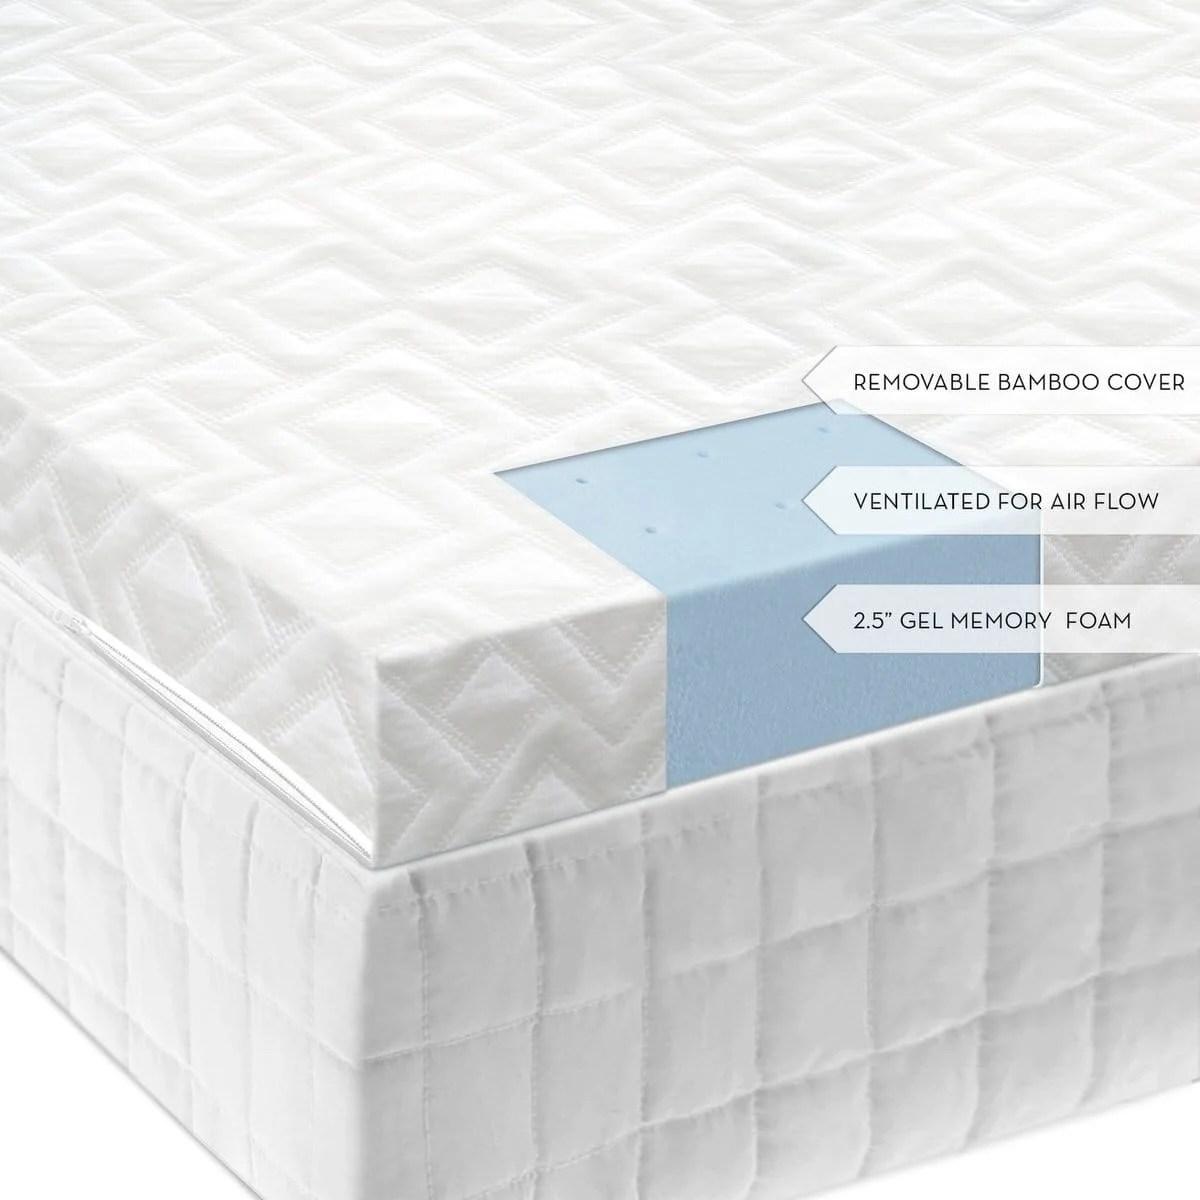 25 Inch Gel Memory Foam Mattress Topper by Comfort Pure